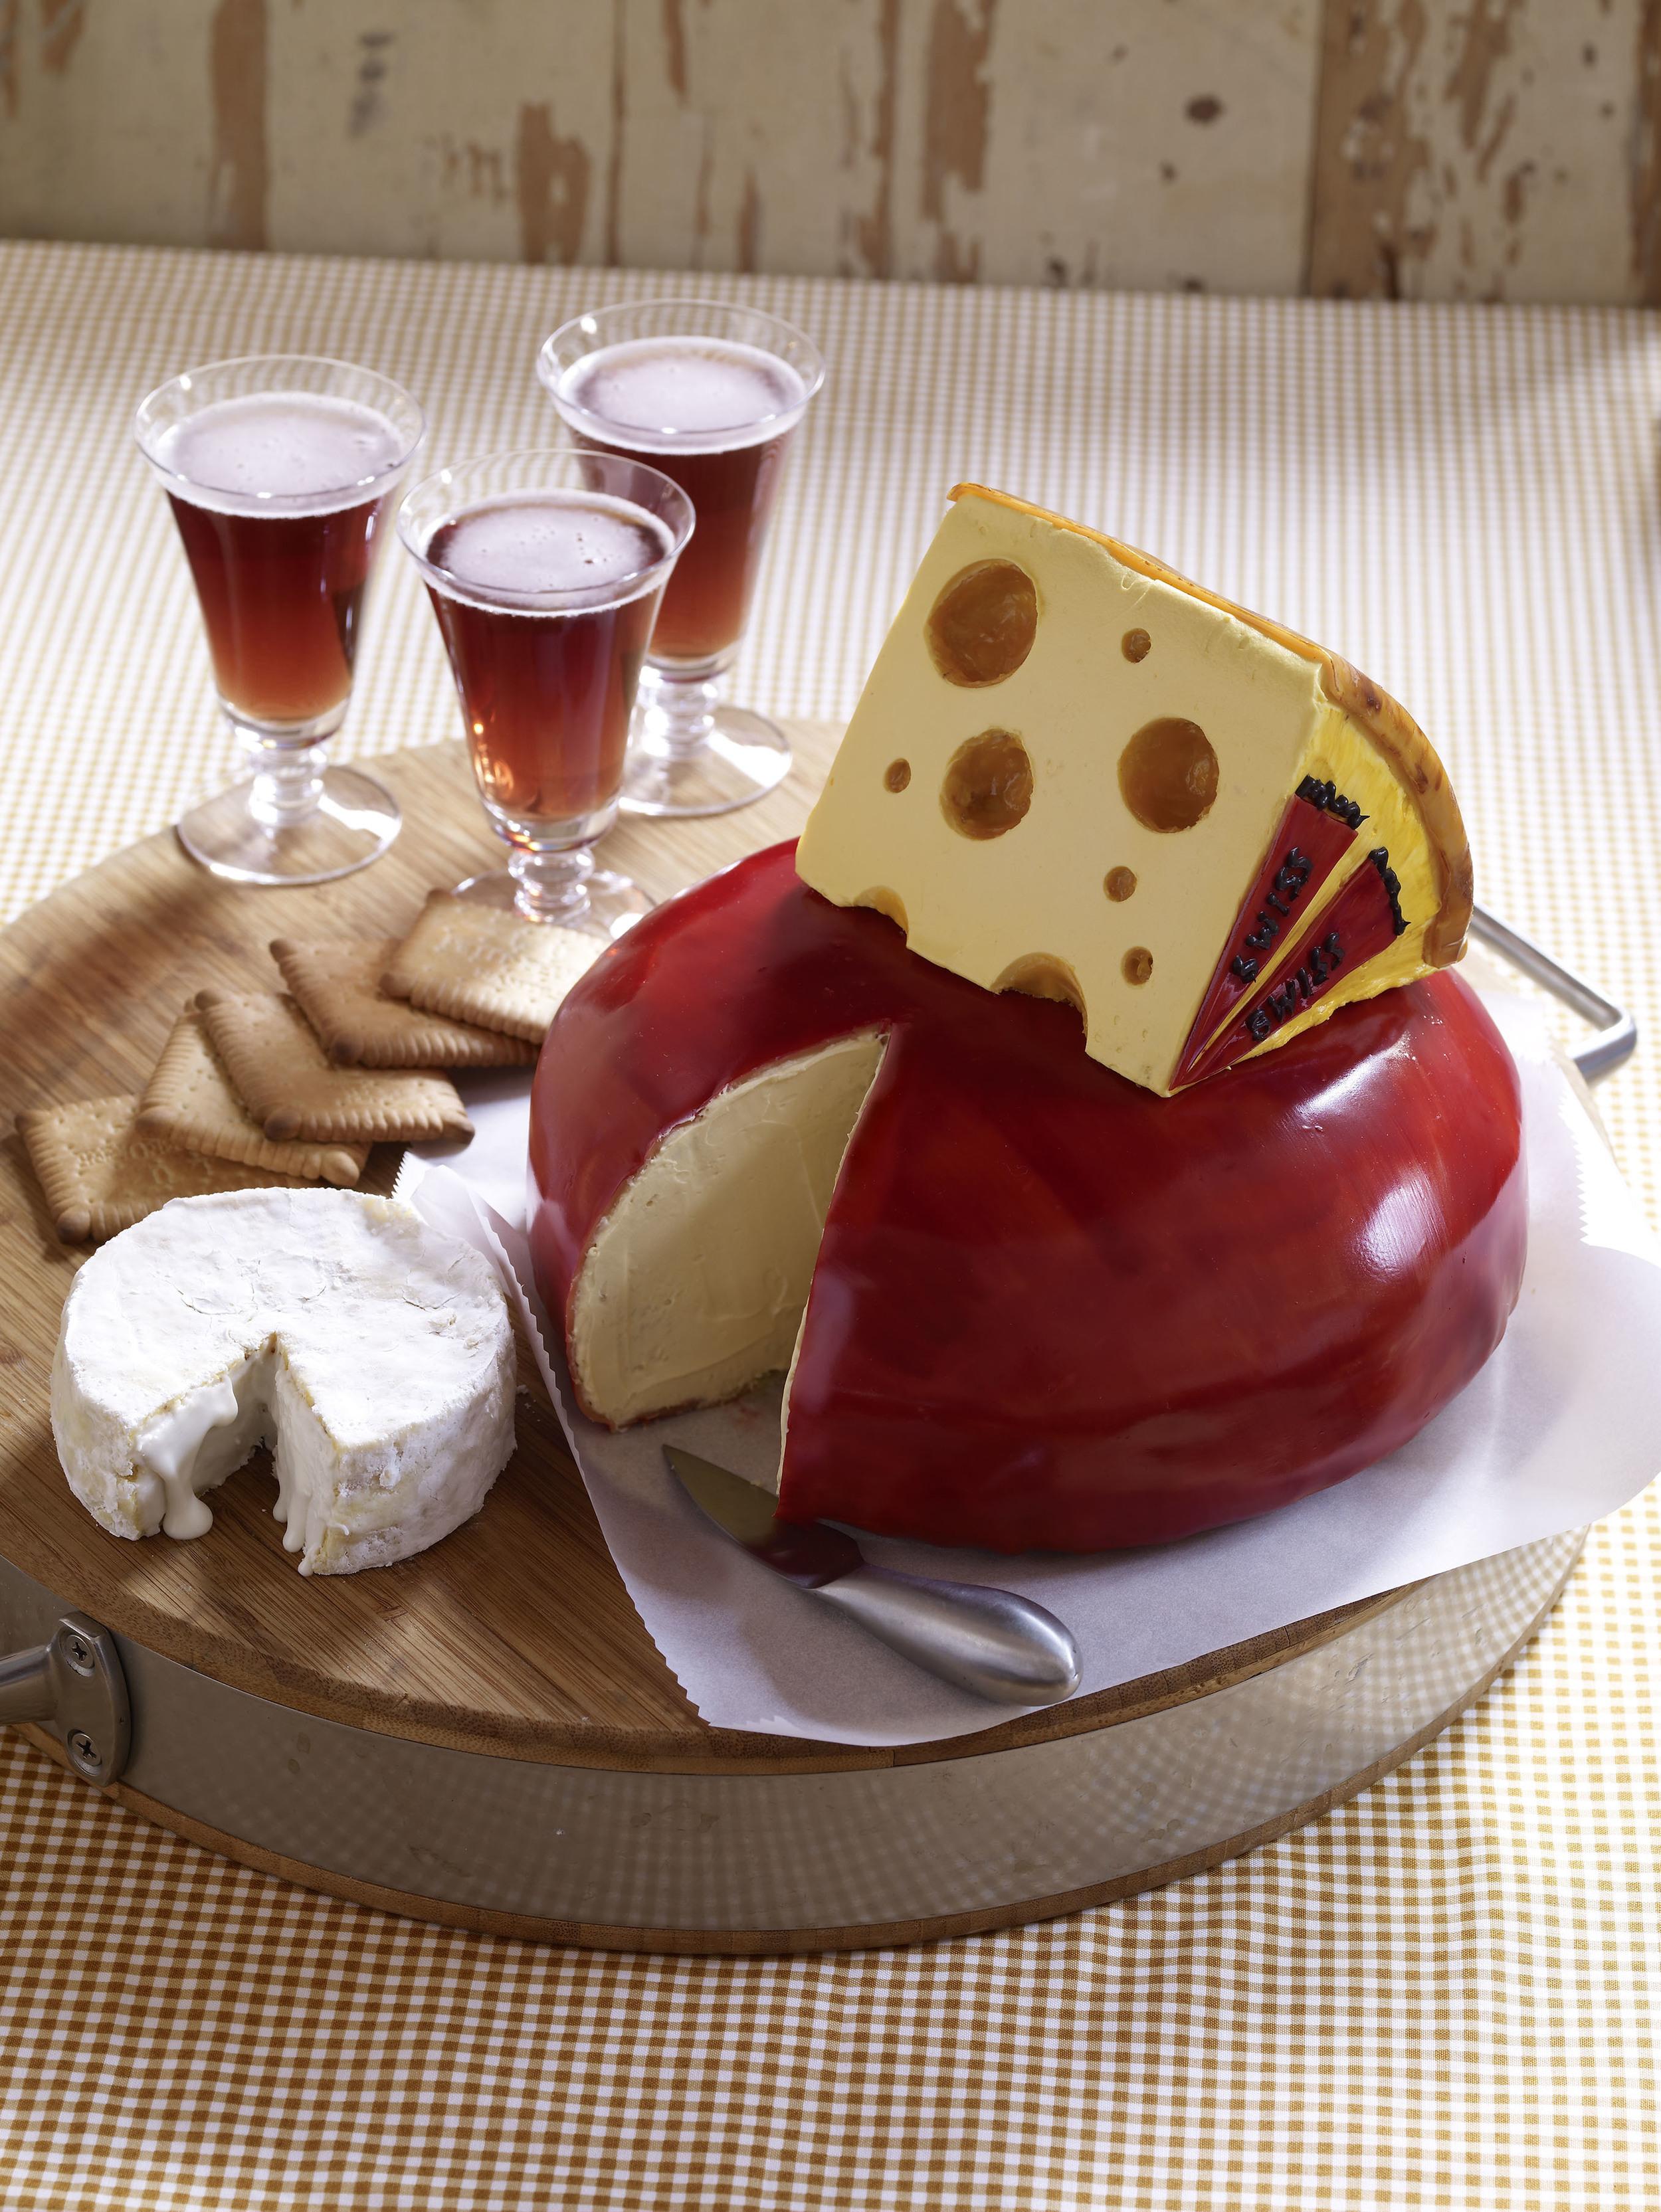 cheese plate cake.jpg